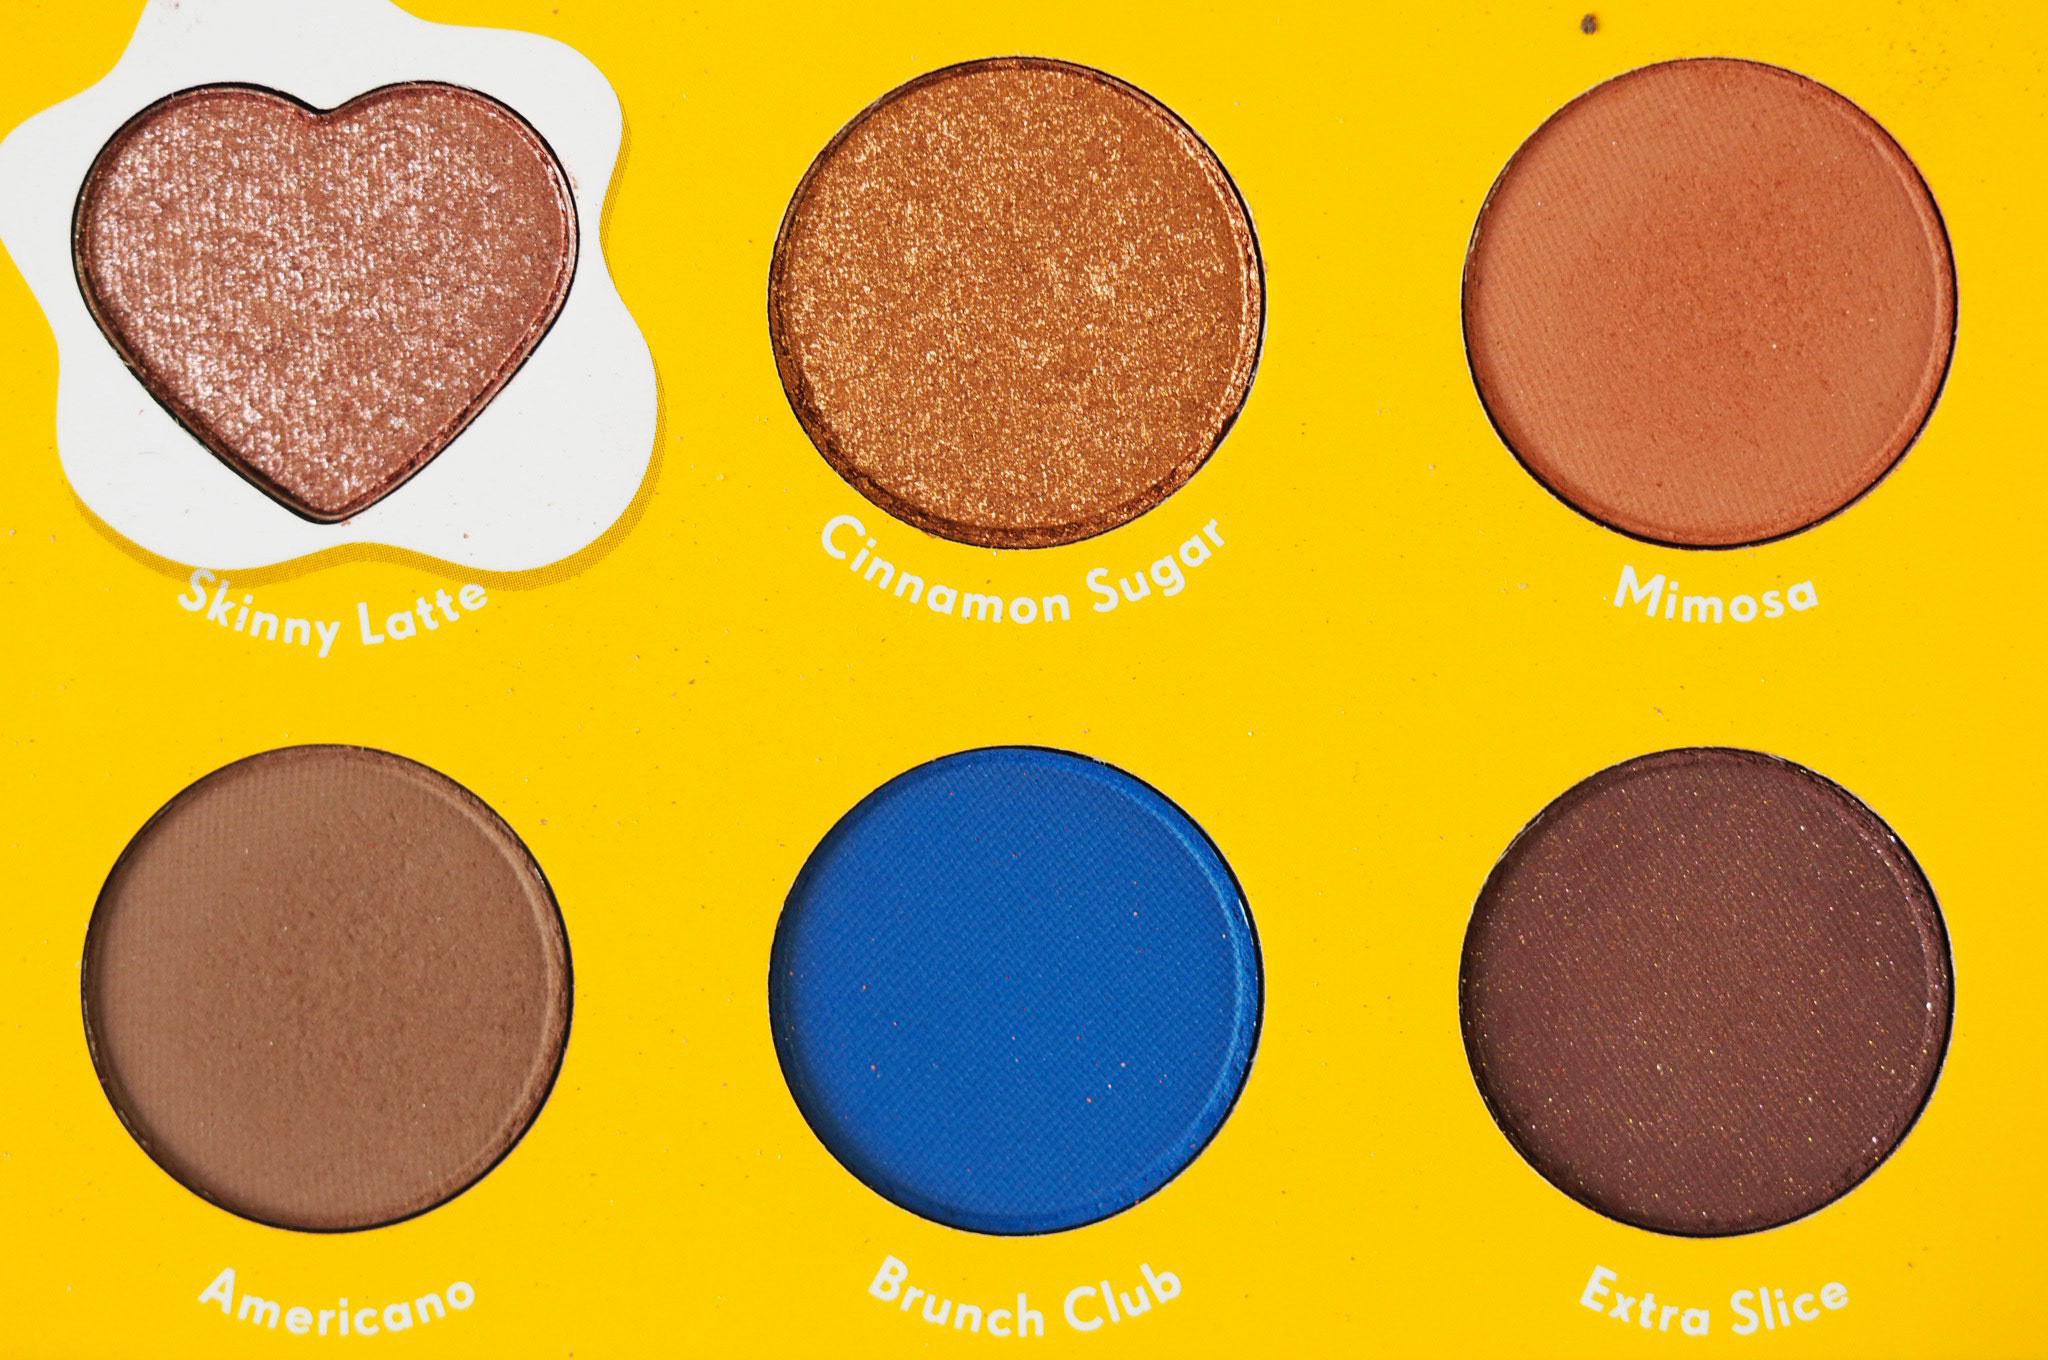 Zoella x Colourpop Brunch Date Eyeshadow Palette Review